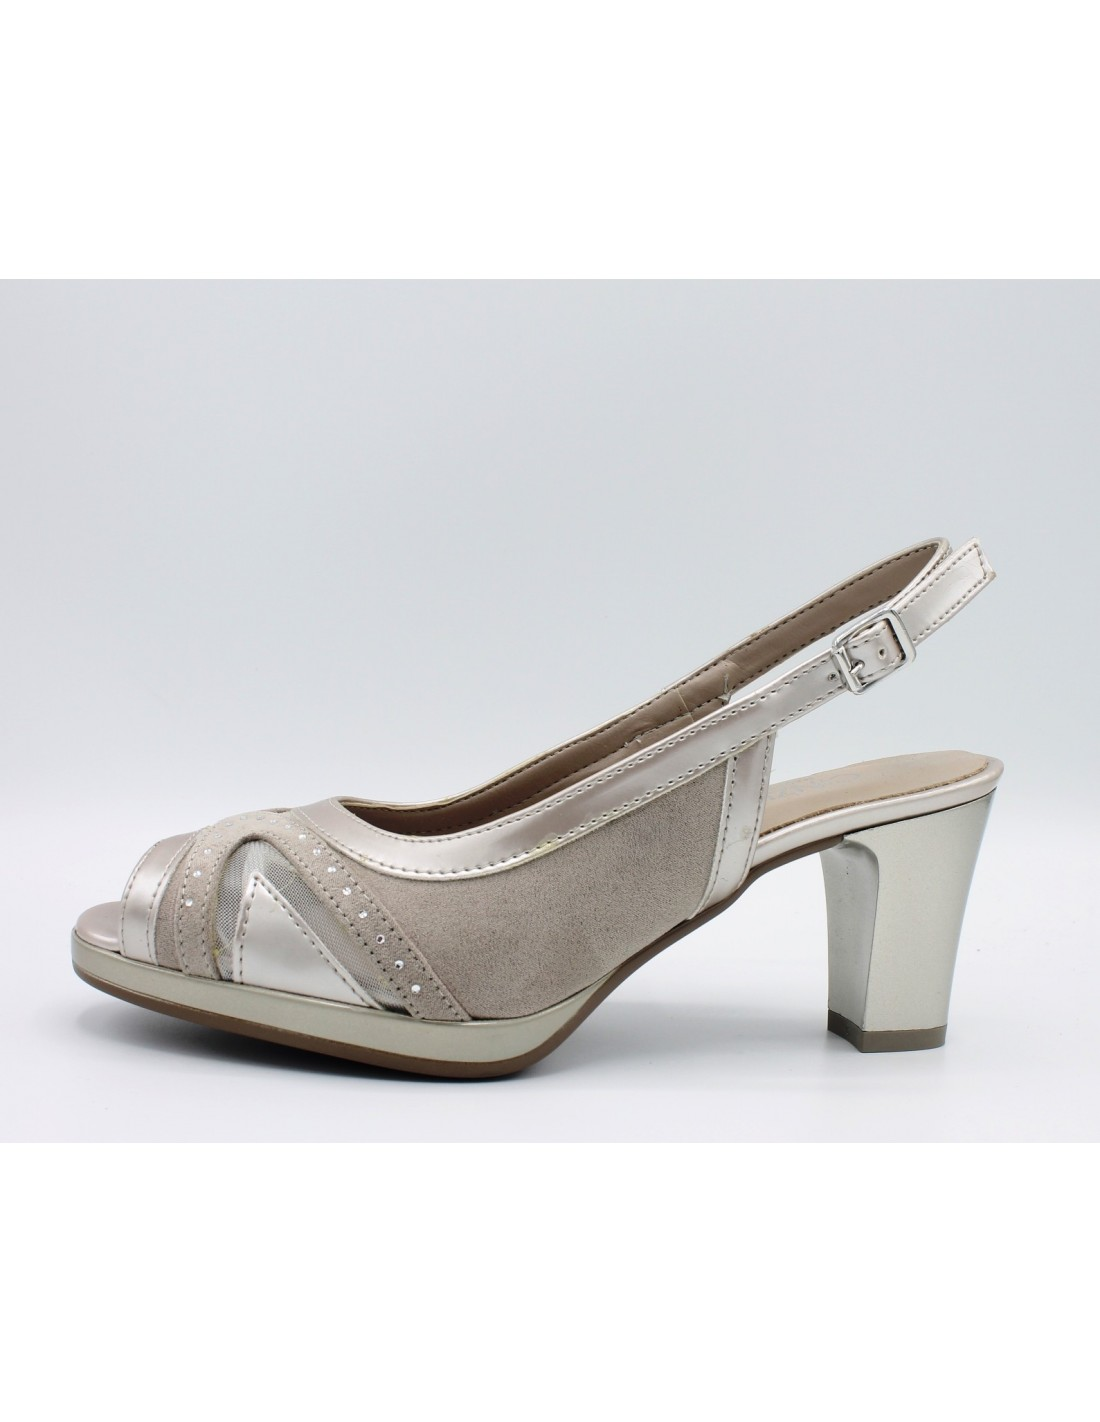 66d3e5ac14 CINZIA SOFT Sandali donna eleganti linea comoda in pelle vernice beige  IAB322319 - Angela Barba